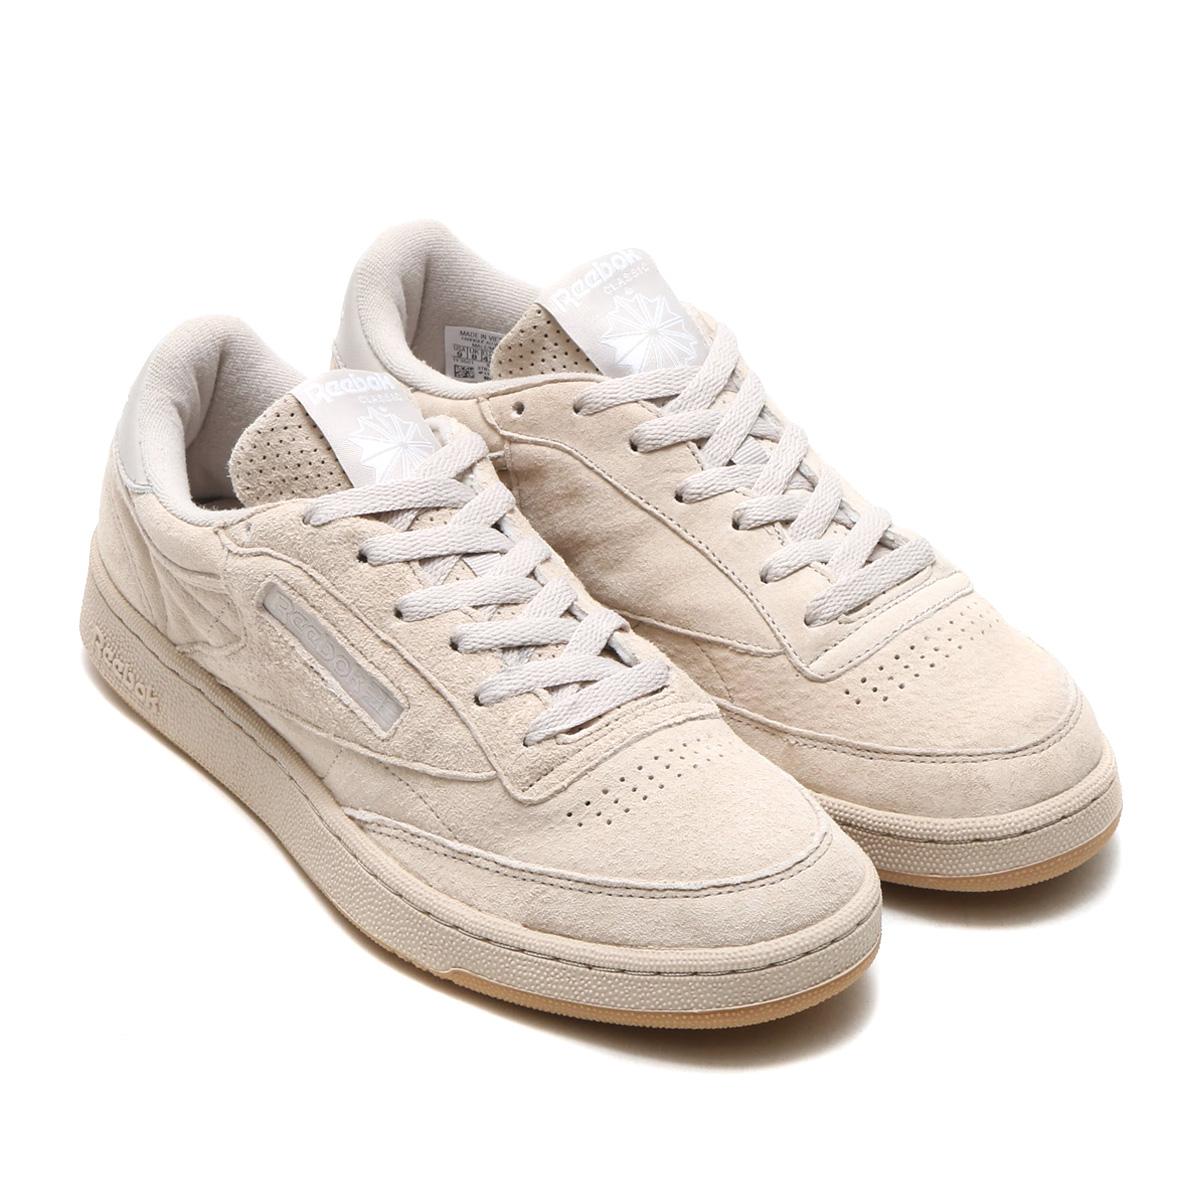 d4ccd3932d2 Reebok CLASSIC (Reebok classical music) sneakers.